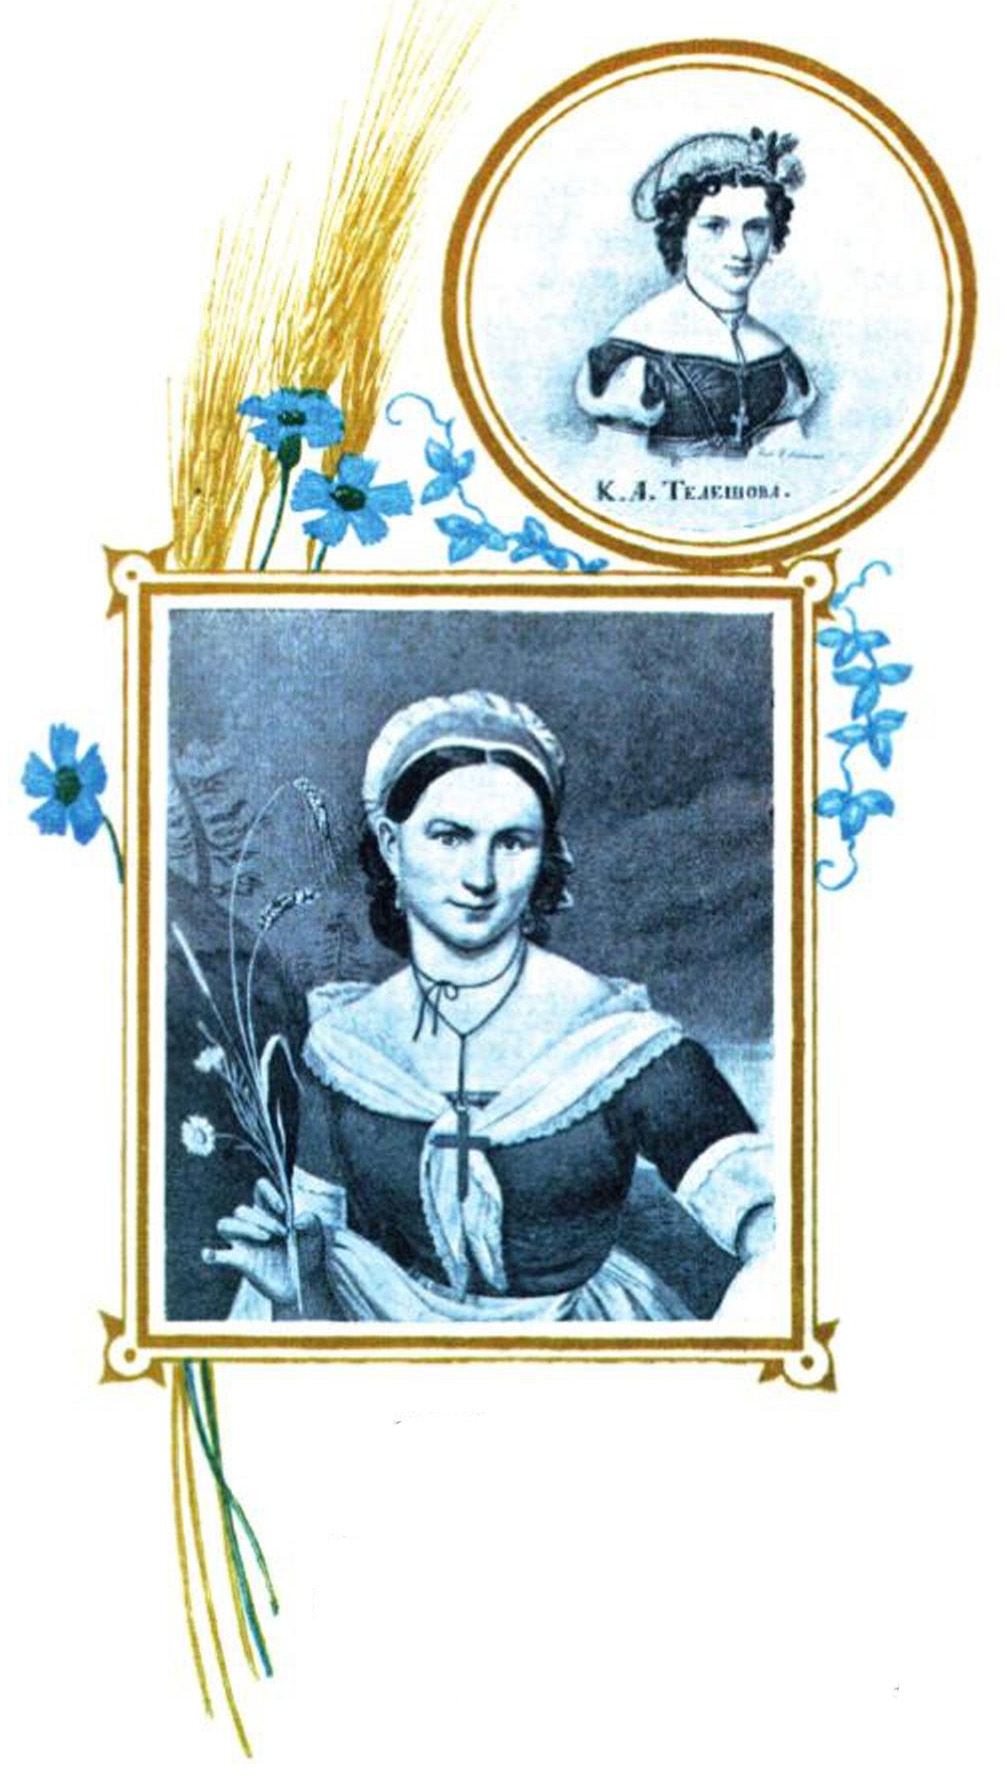 Телешова К.А. (С портрета Кипренского О. 1828) 16 илл. из 4 тома